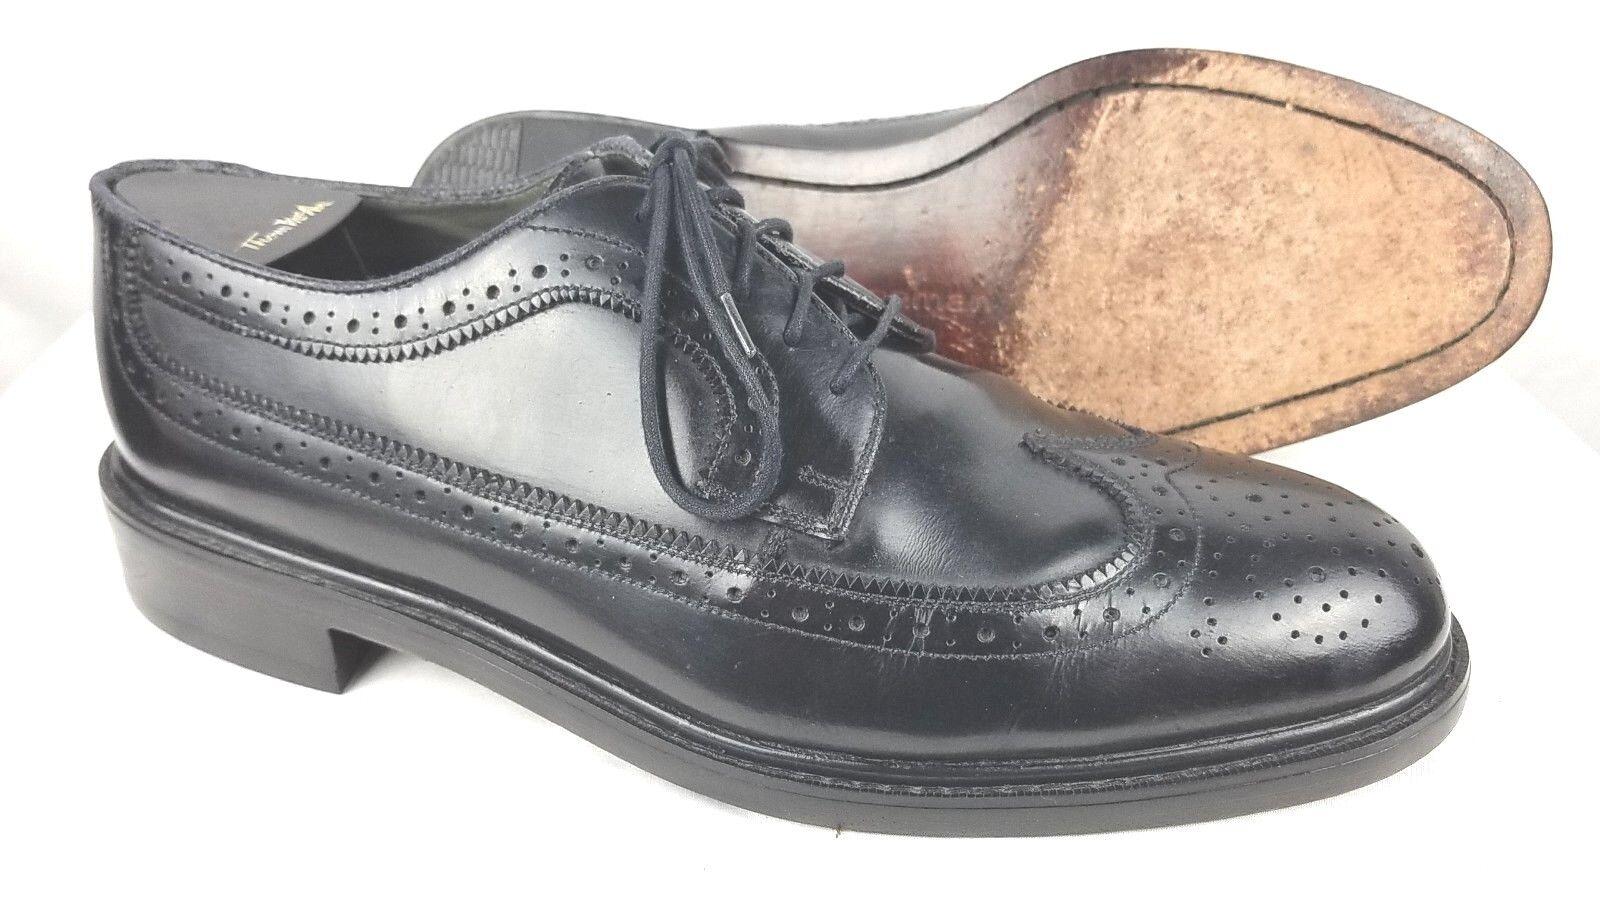 JARMAN Men's Black Leather Longwings bluecher Oxford Dress shoes Brogue Size 10 M